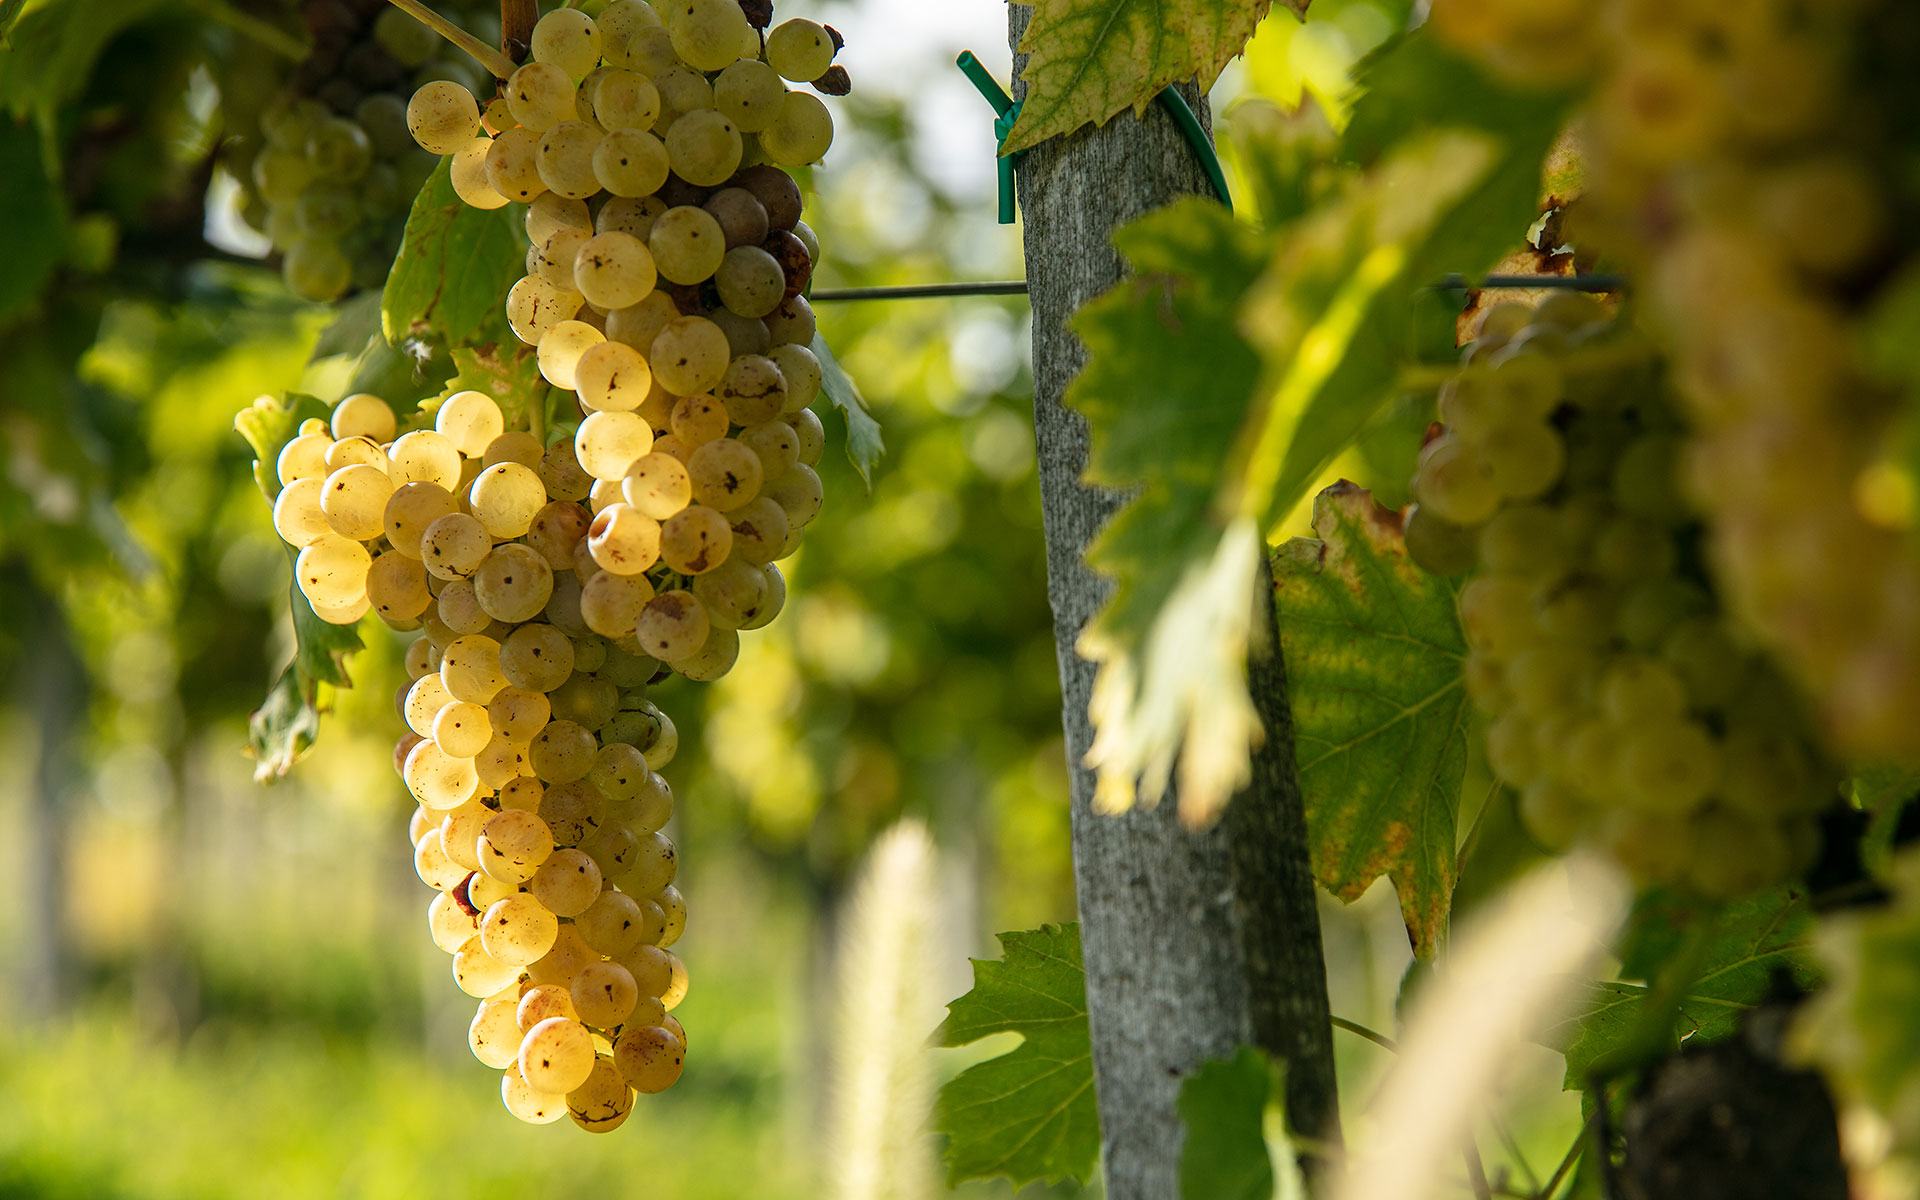 ozmec_vineyard_maro_wine_mursa_m_studio_ma-ma-marinsek_20_6